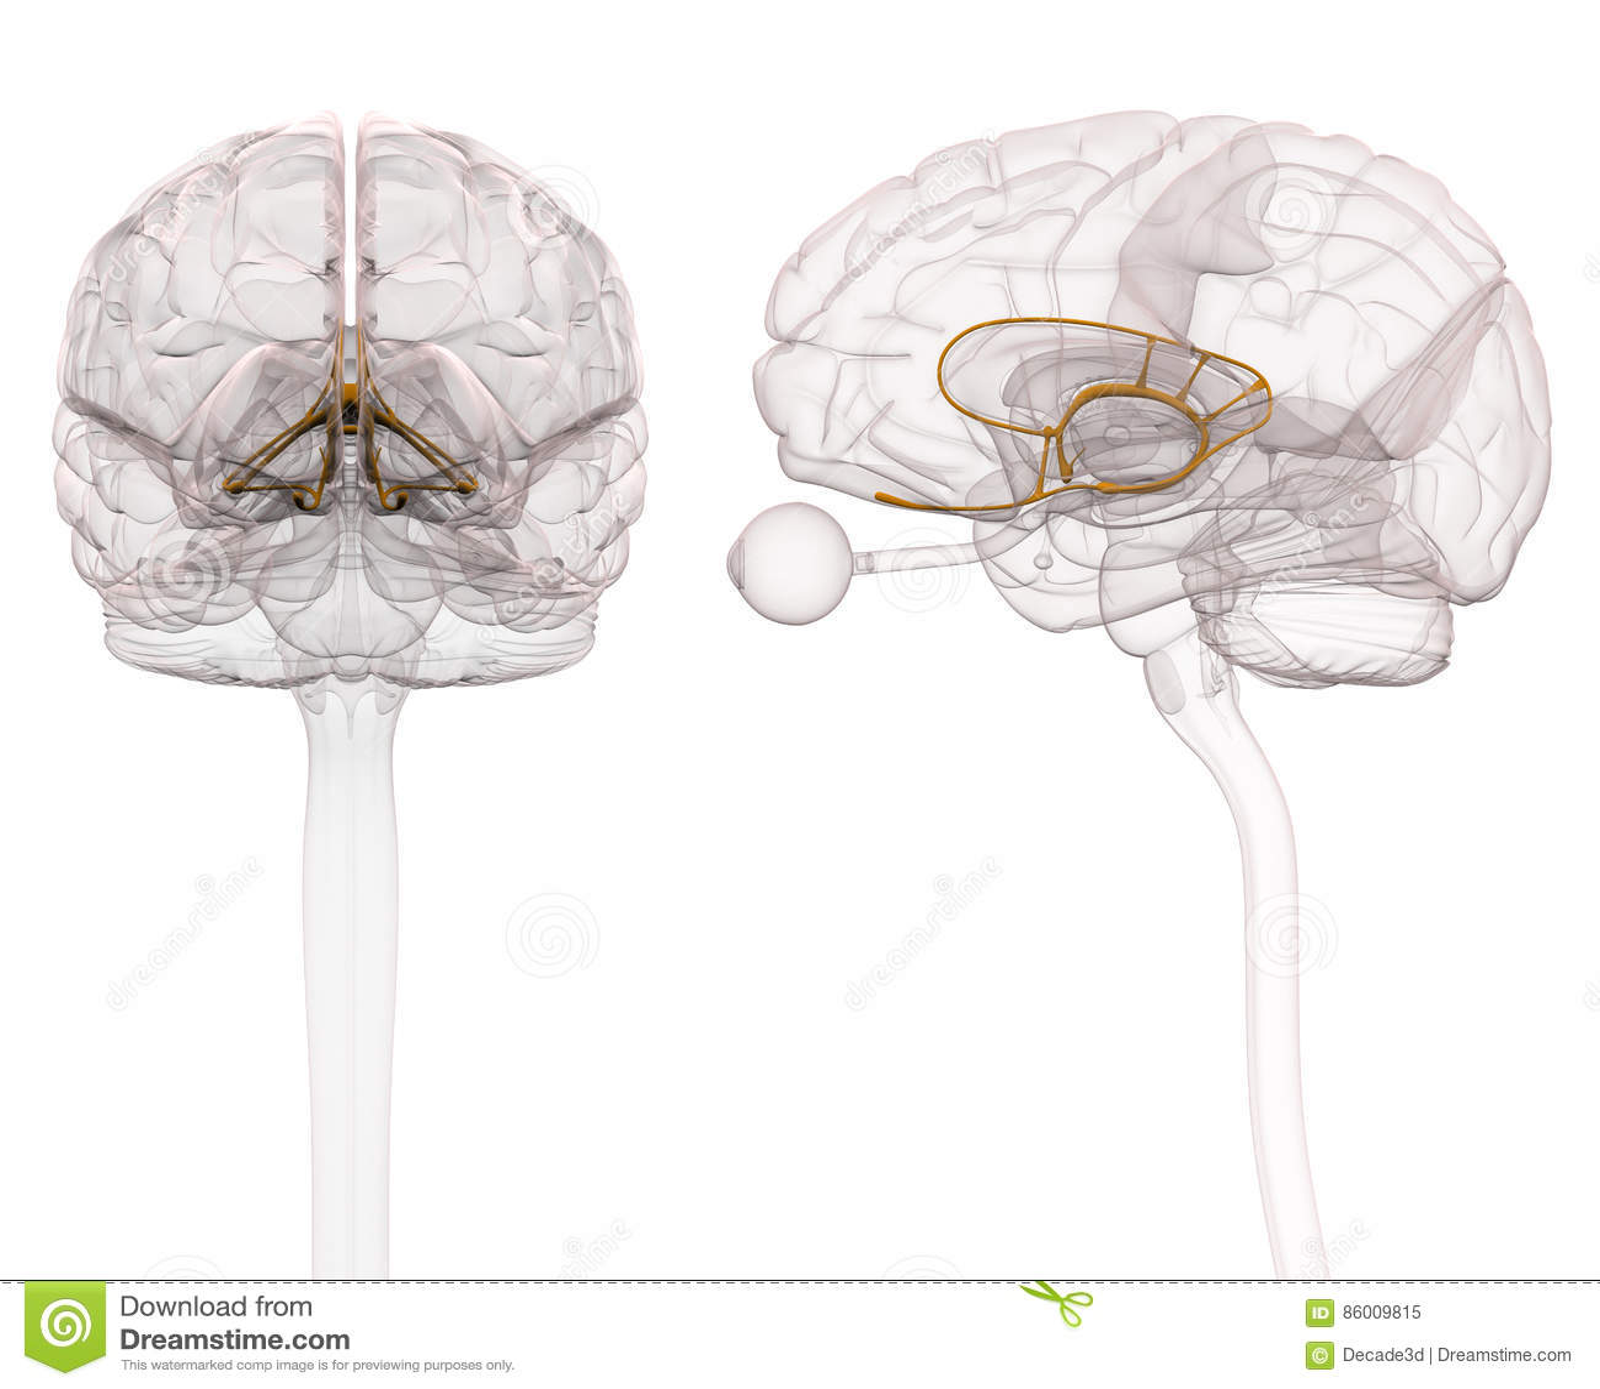 Limbic System Brain Anatomy - 3d Illustration Stock Illustration ...